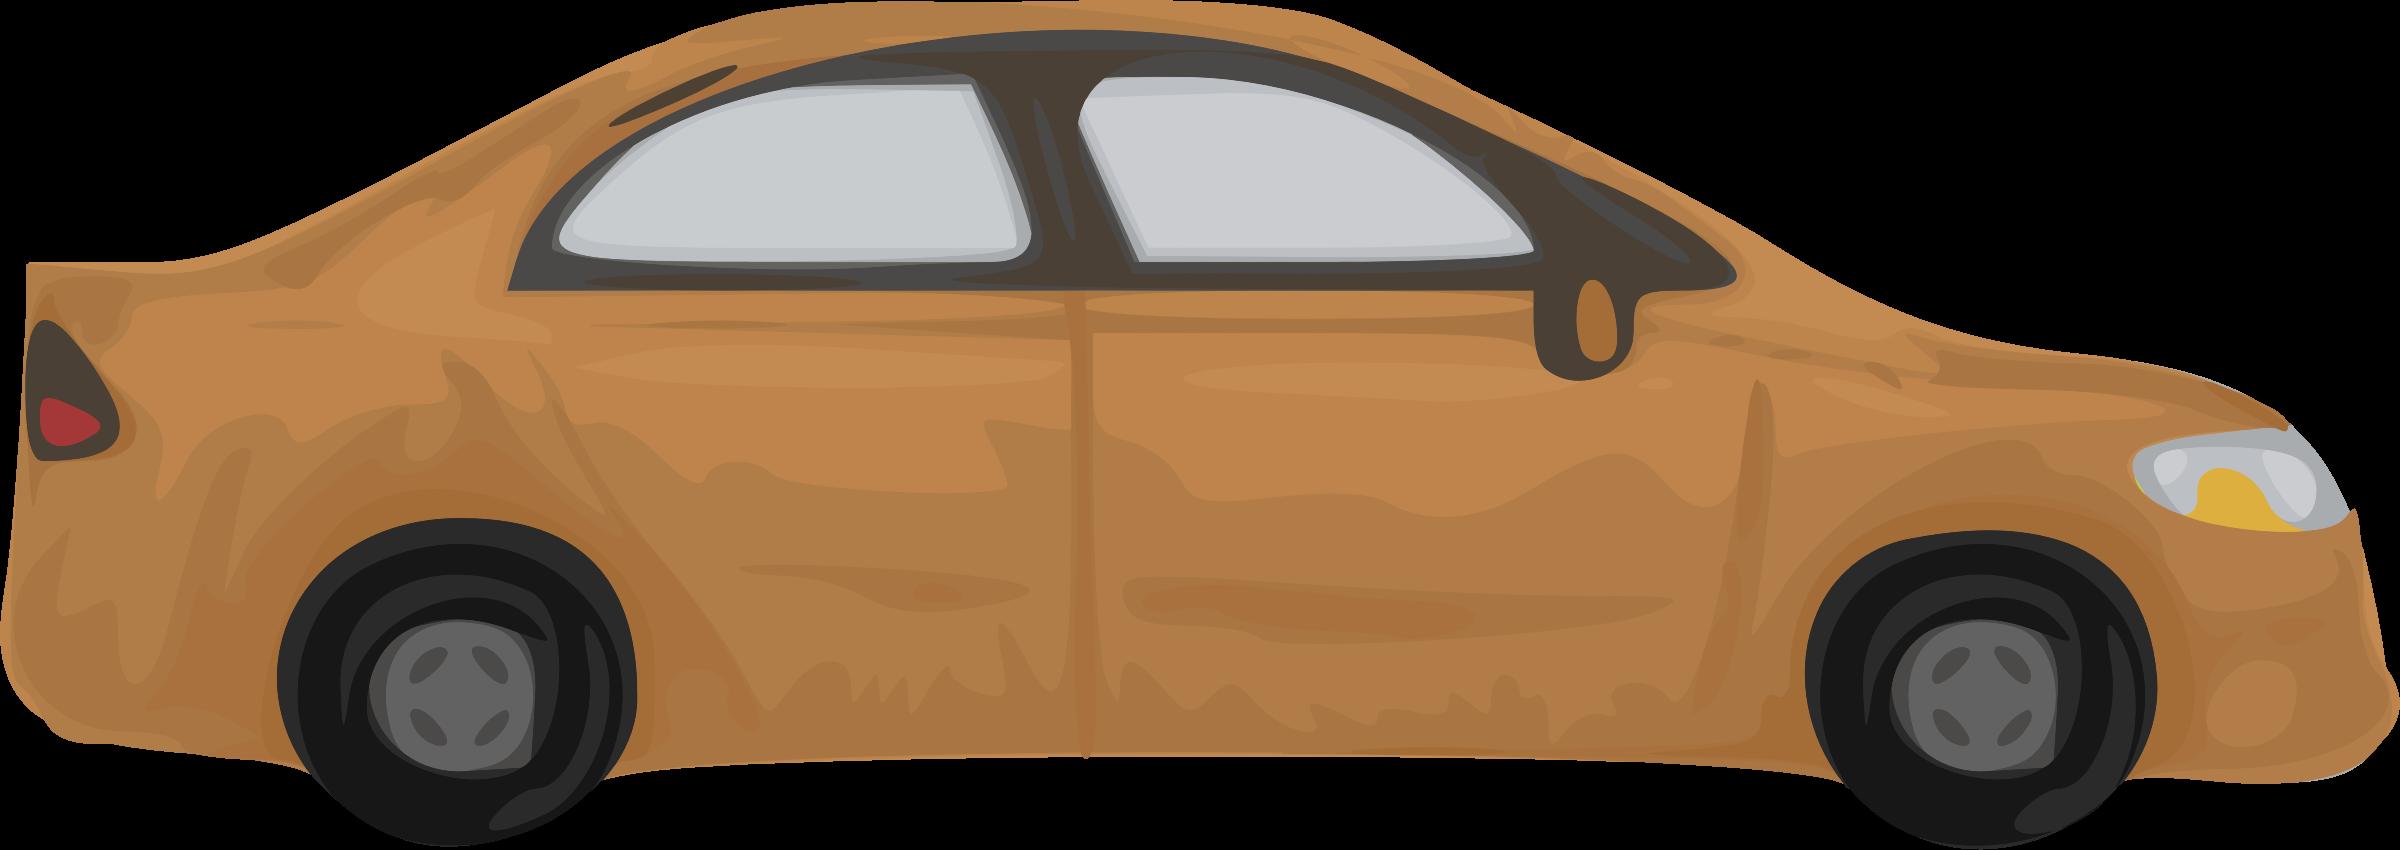 Clipart car orange. Rough brown big image